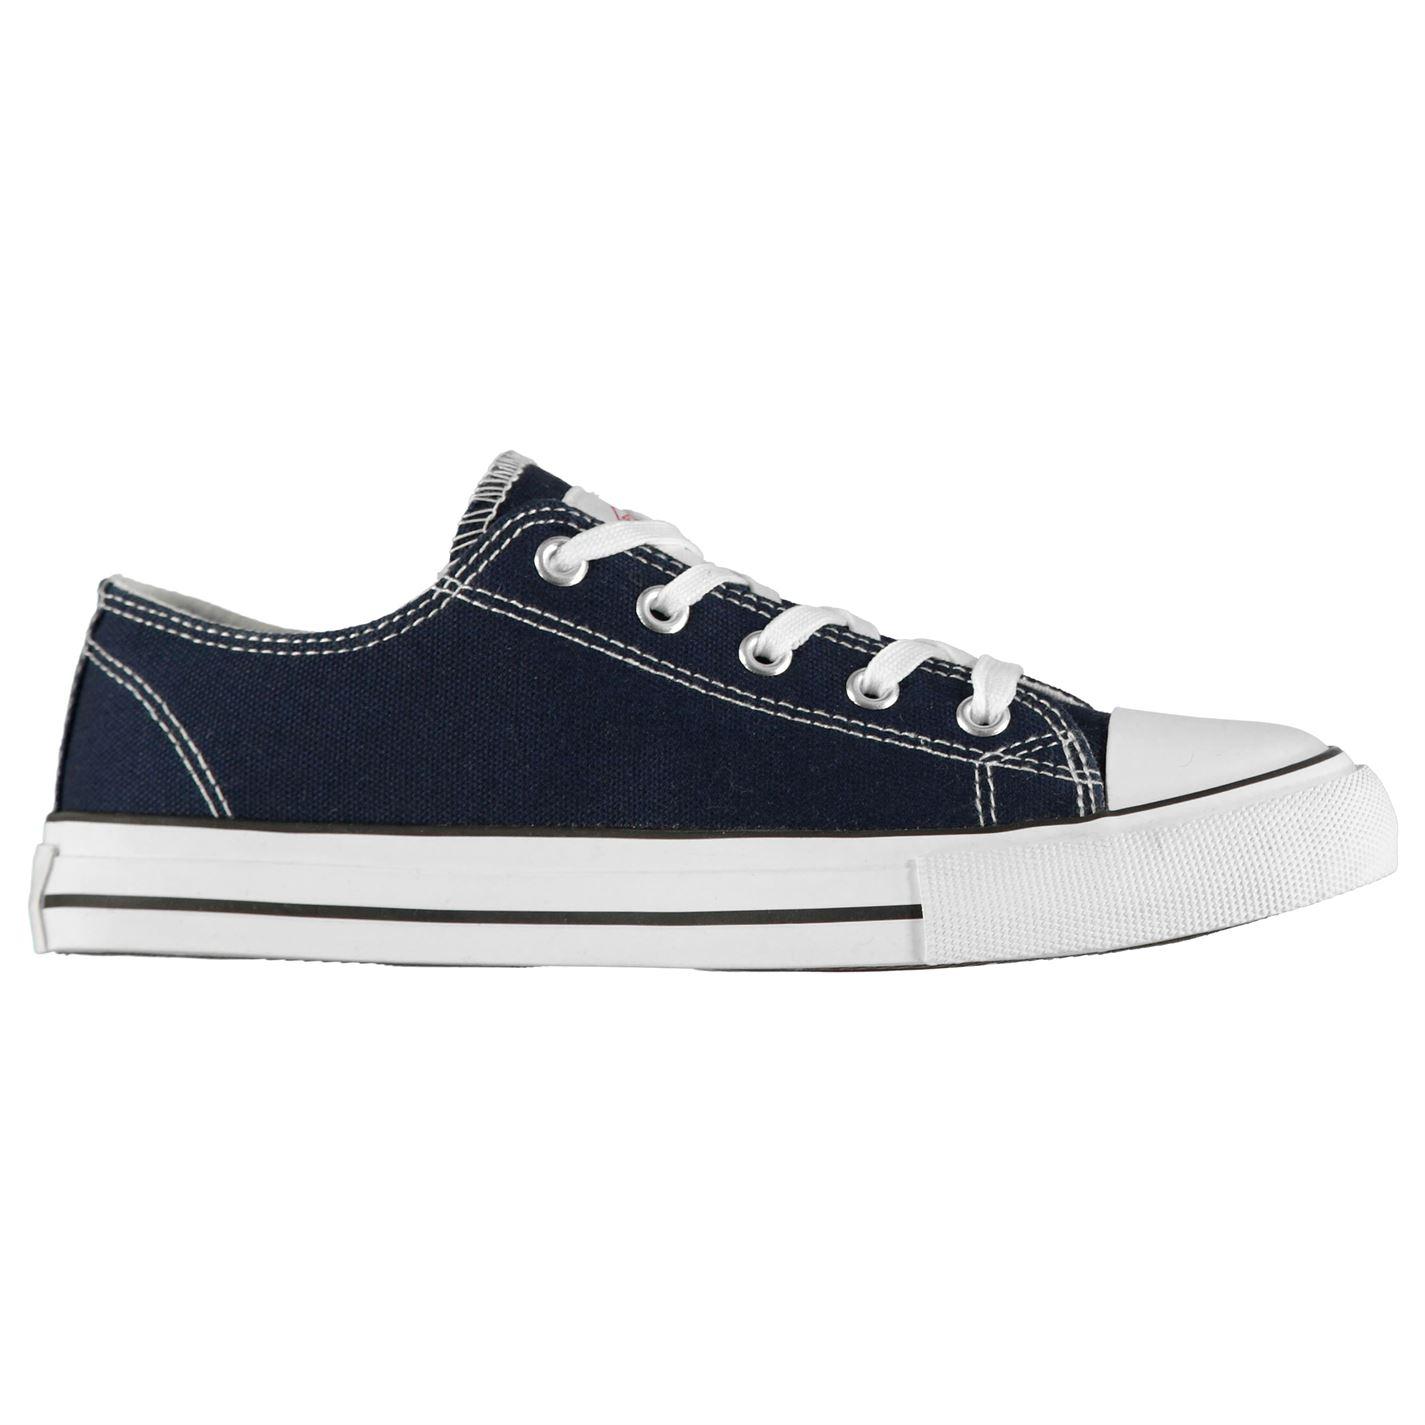 Lee Cooper Canvas Lo Shoes Unisex Juniors